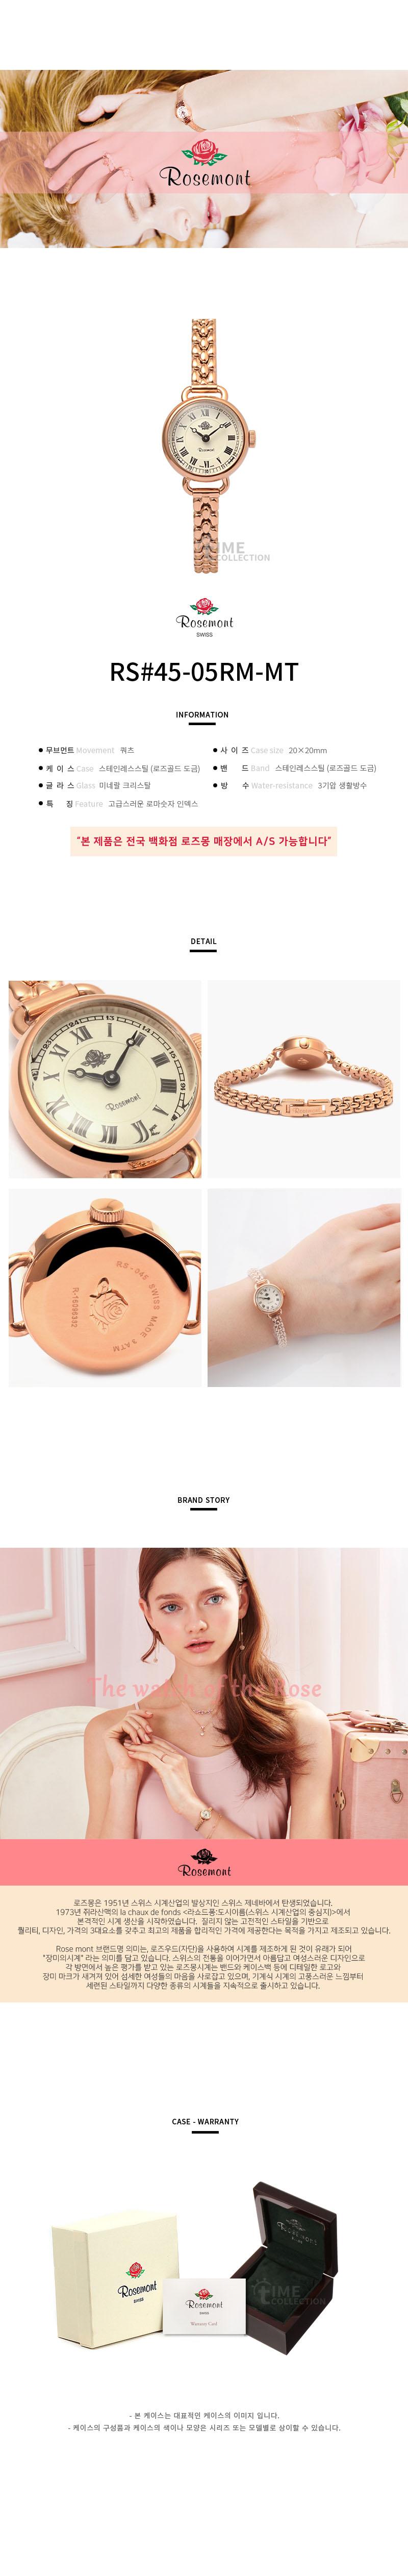 Rosemont Rosemont Department Storeas Metal Watches Rs 45 05rm Mt